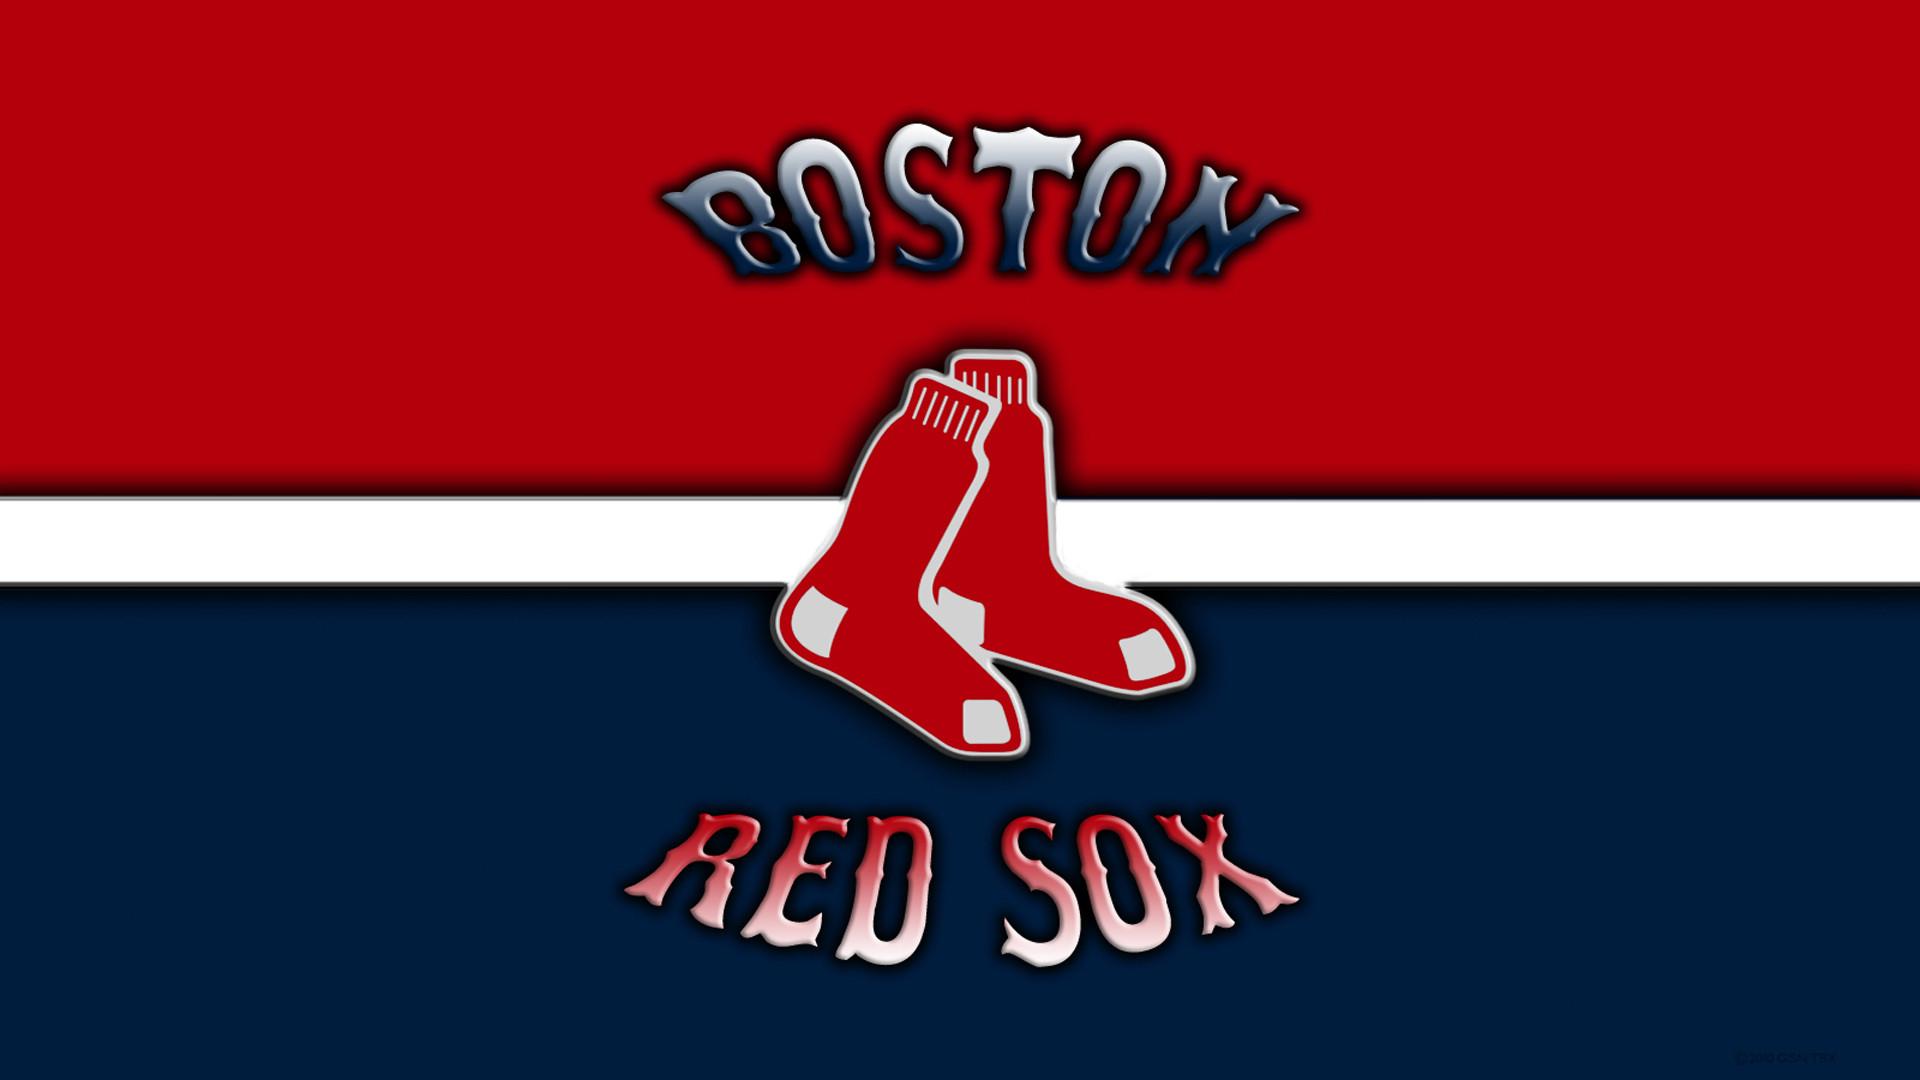 1920x1080 Red Sox Fenway